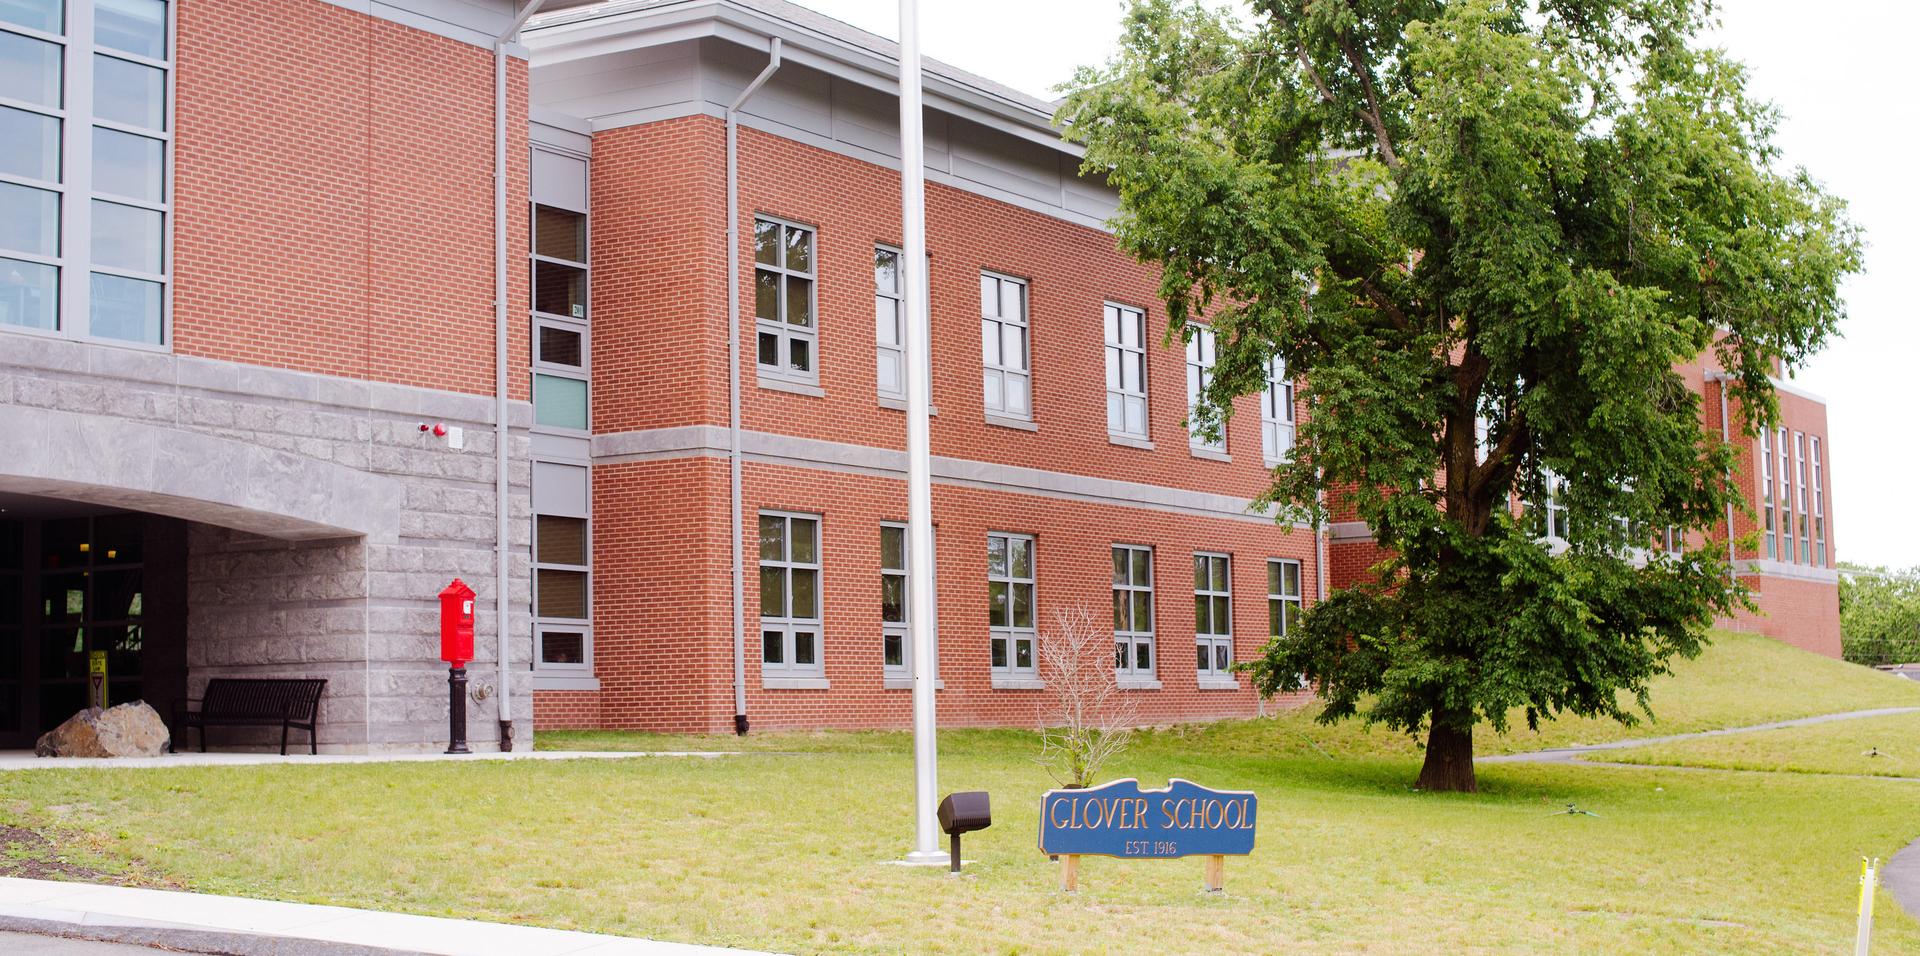 Glover School